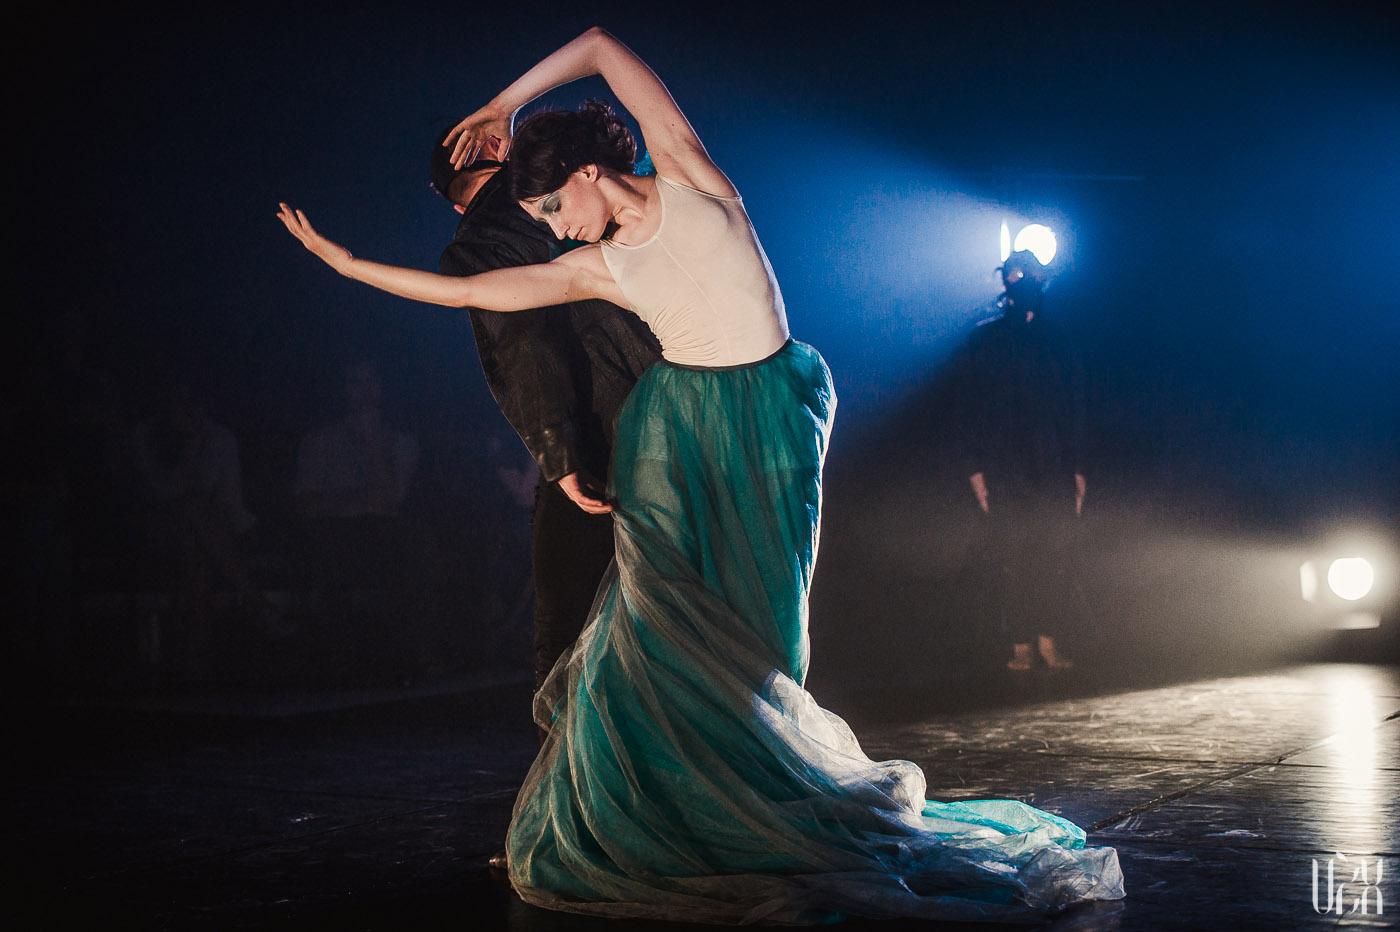 E.sabaliauskaite Vzx.lt Faustas Teatras Event 021